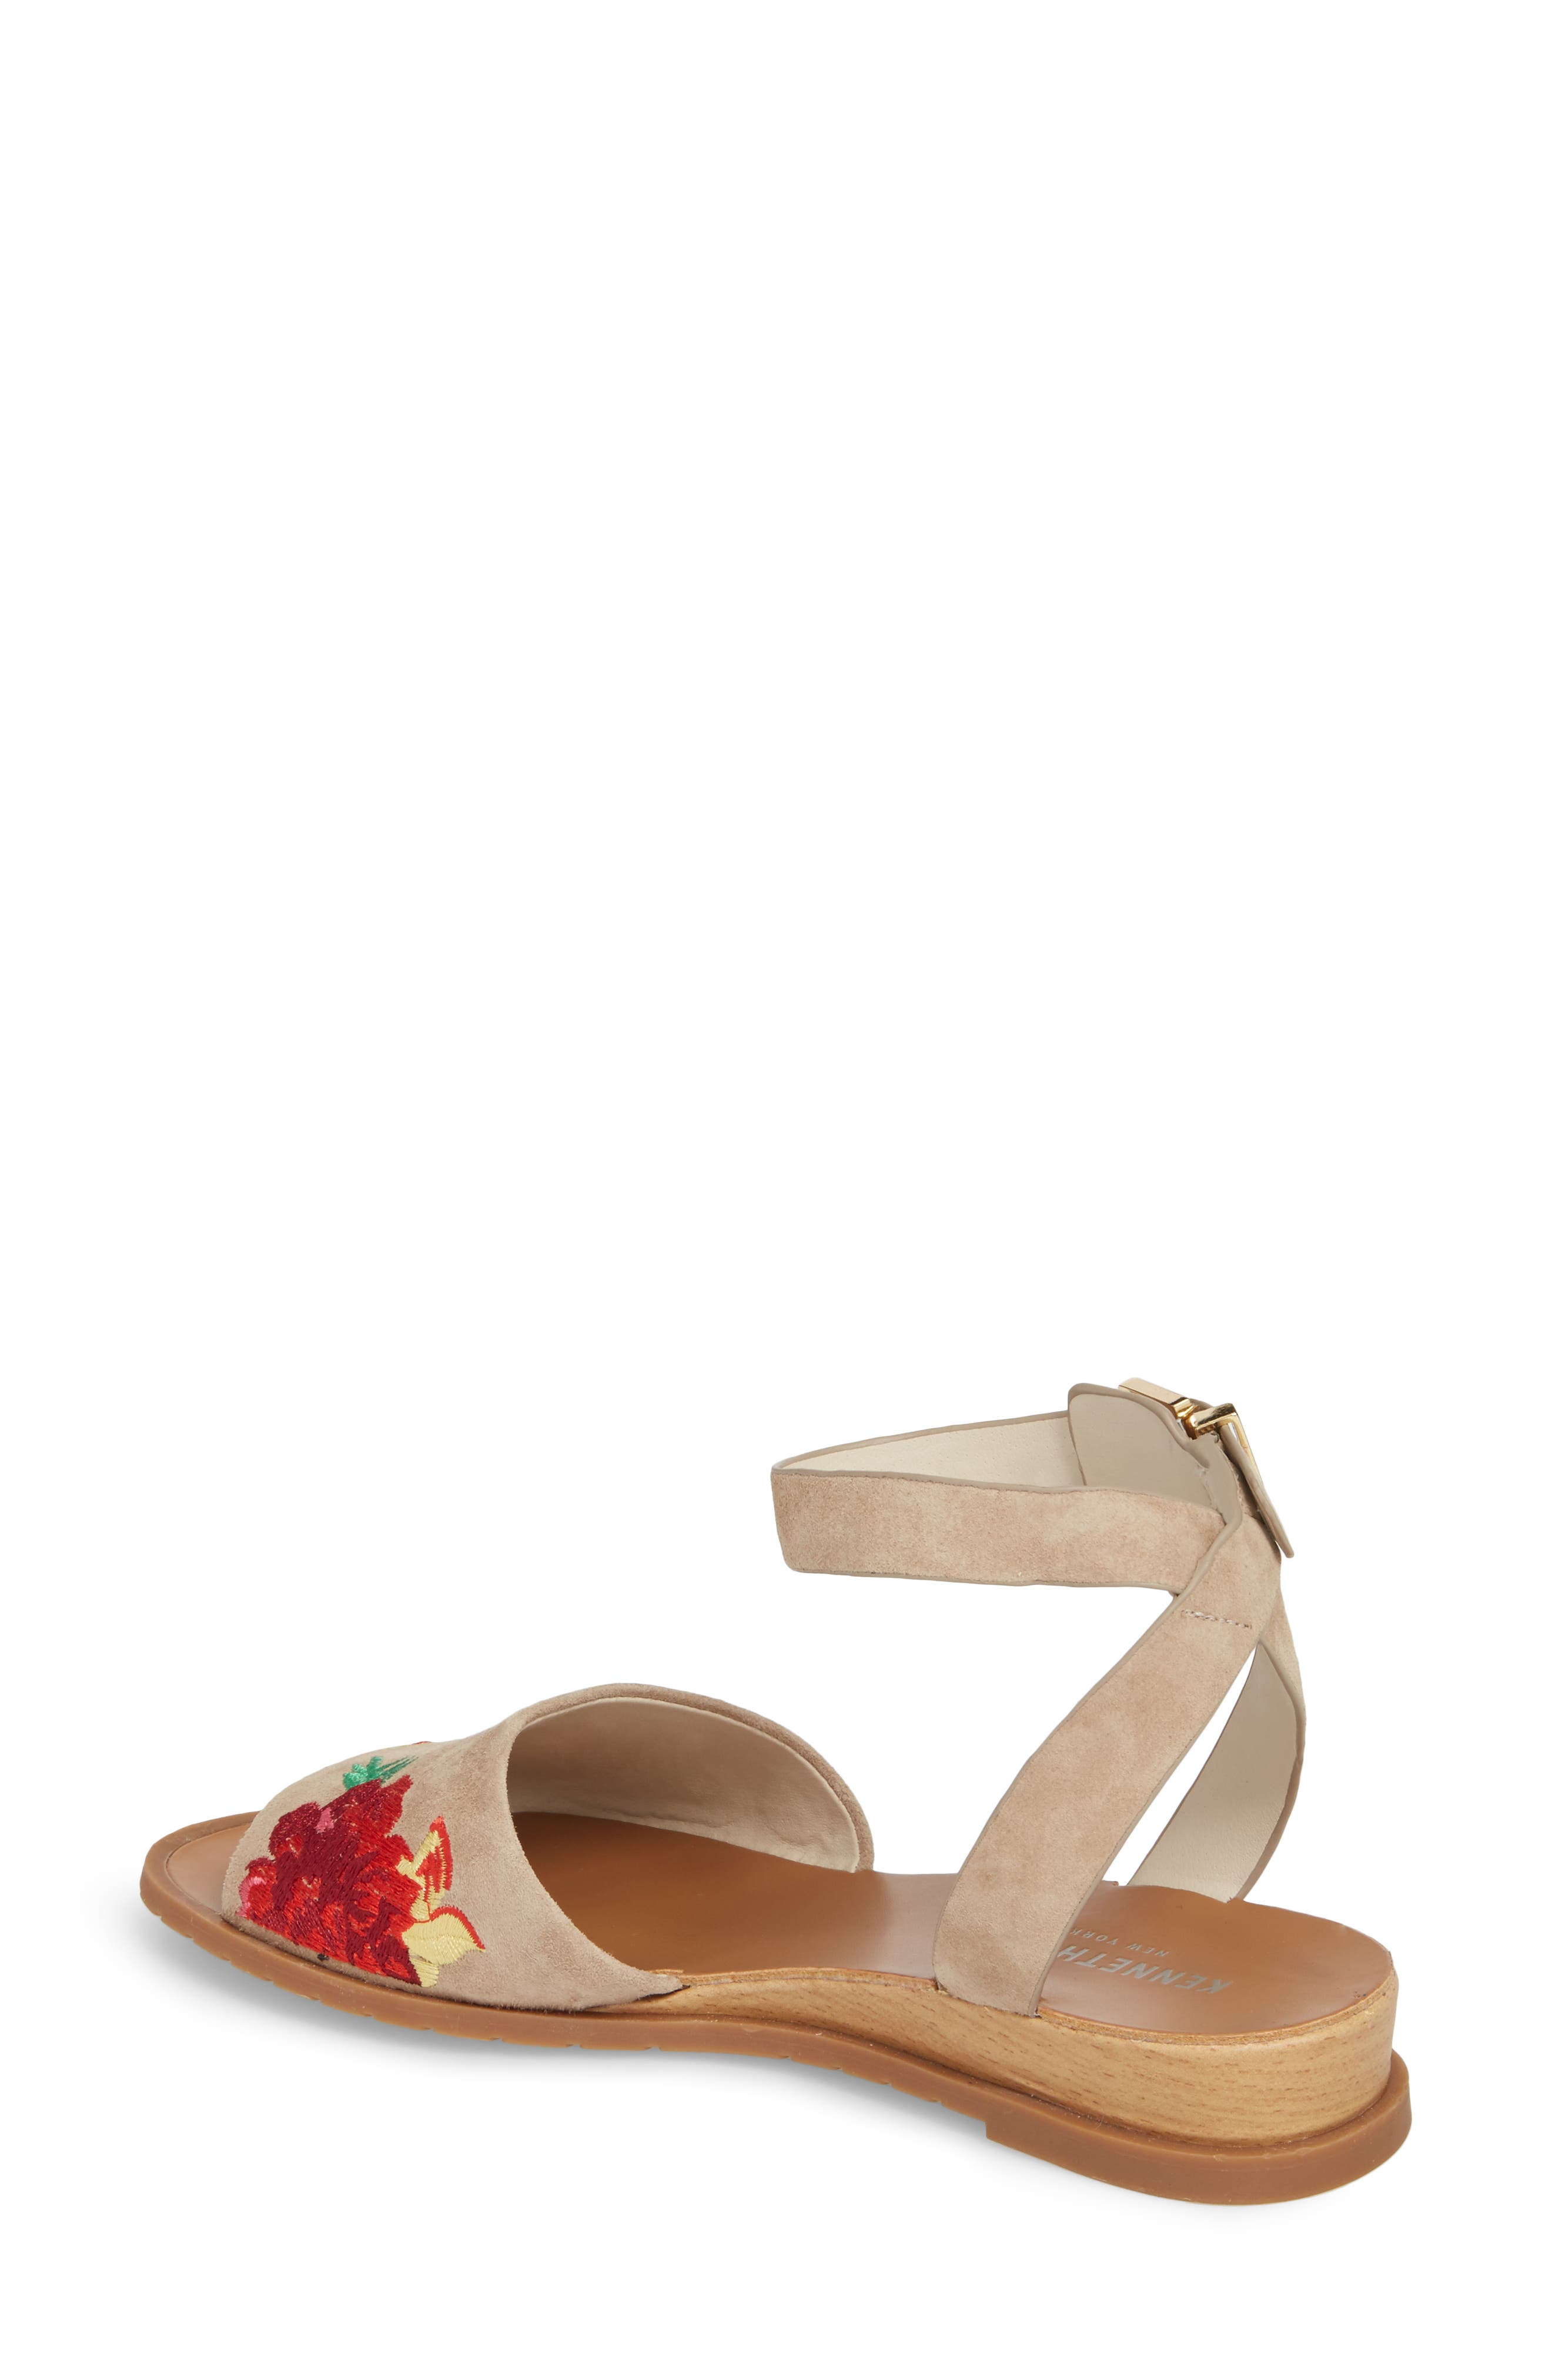 Jinny Ankle Strap Sandal,                             Alternate thumbnail 2, color,                             250